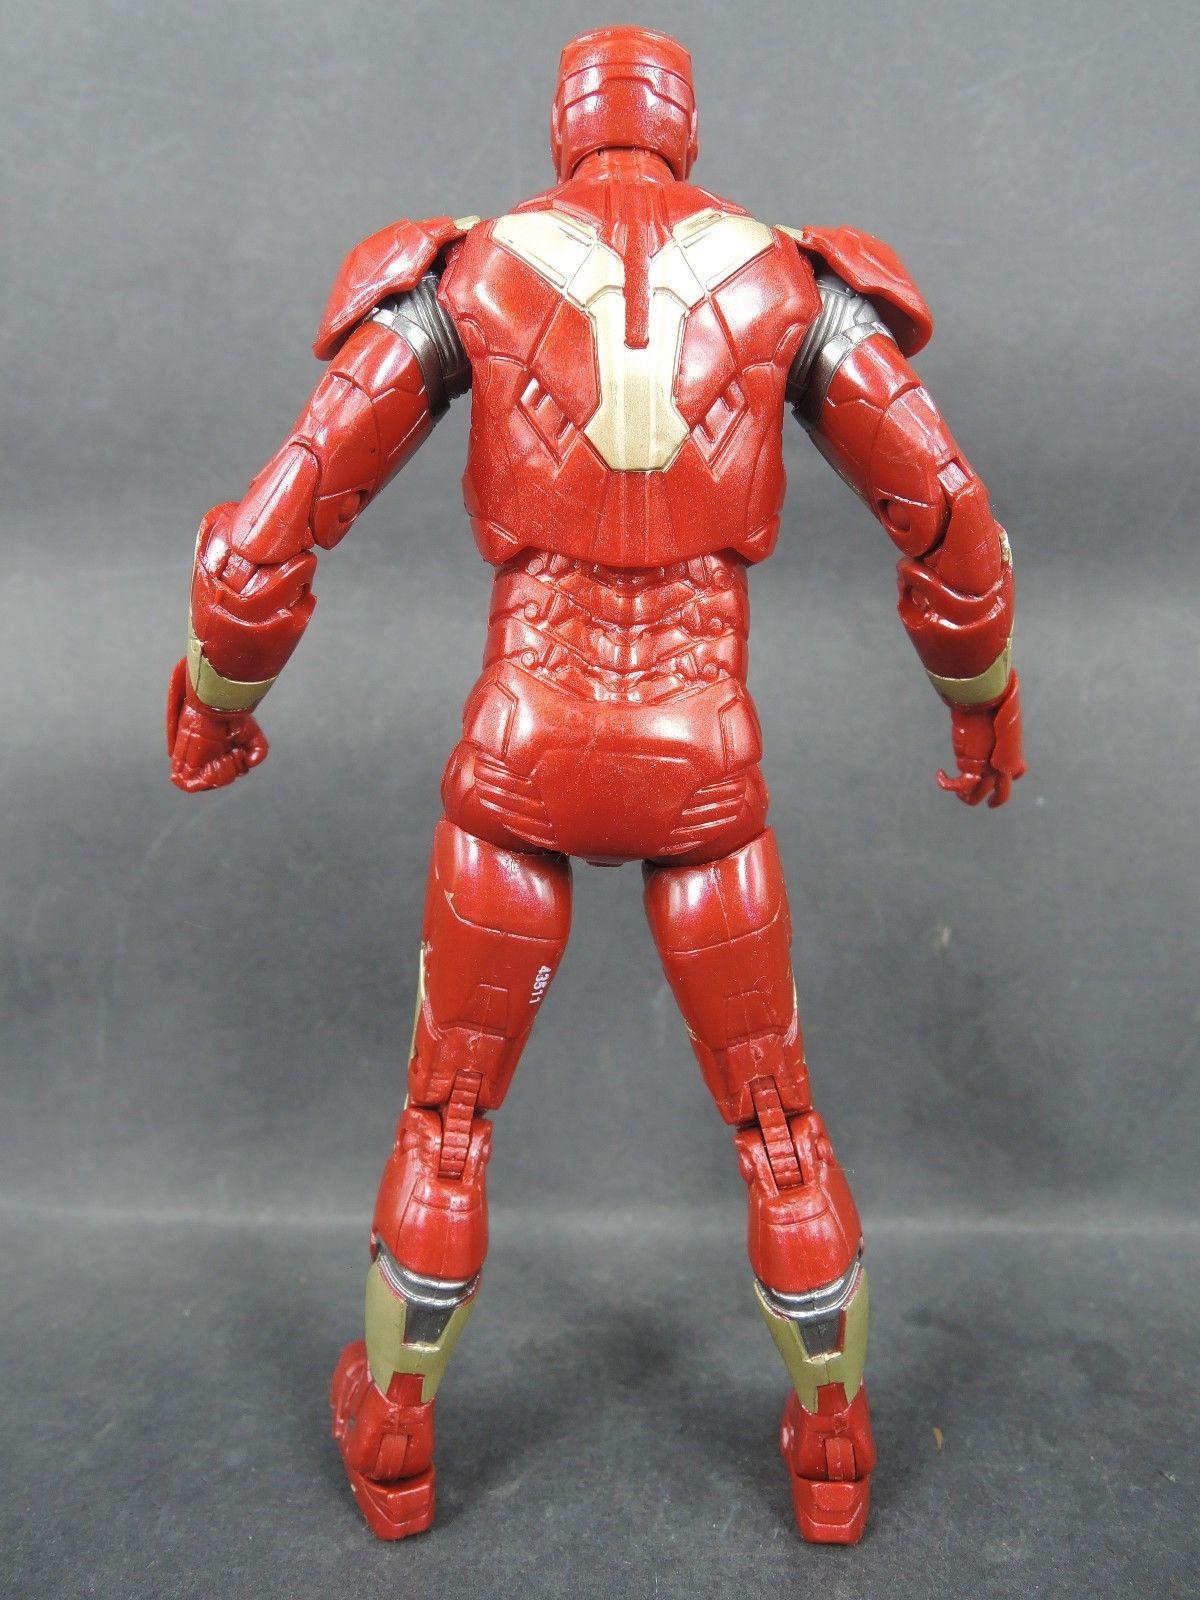 The Avengers Age of Ultron Iron Man Mark 43 Ultron Iron Man Mark 43 2